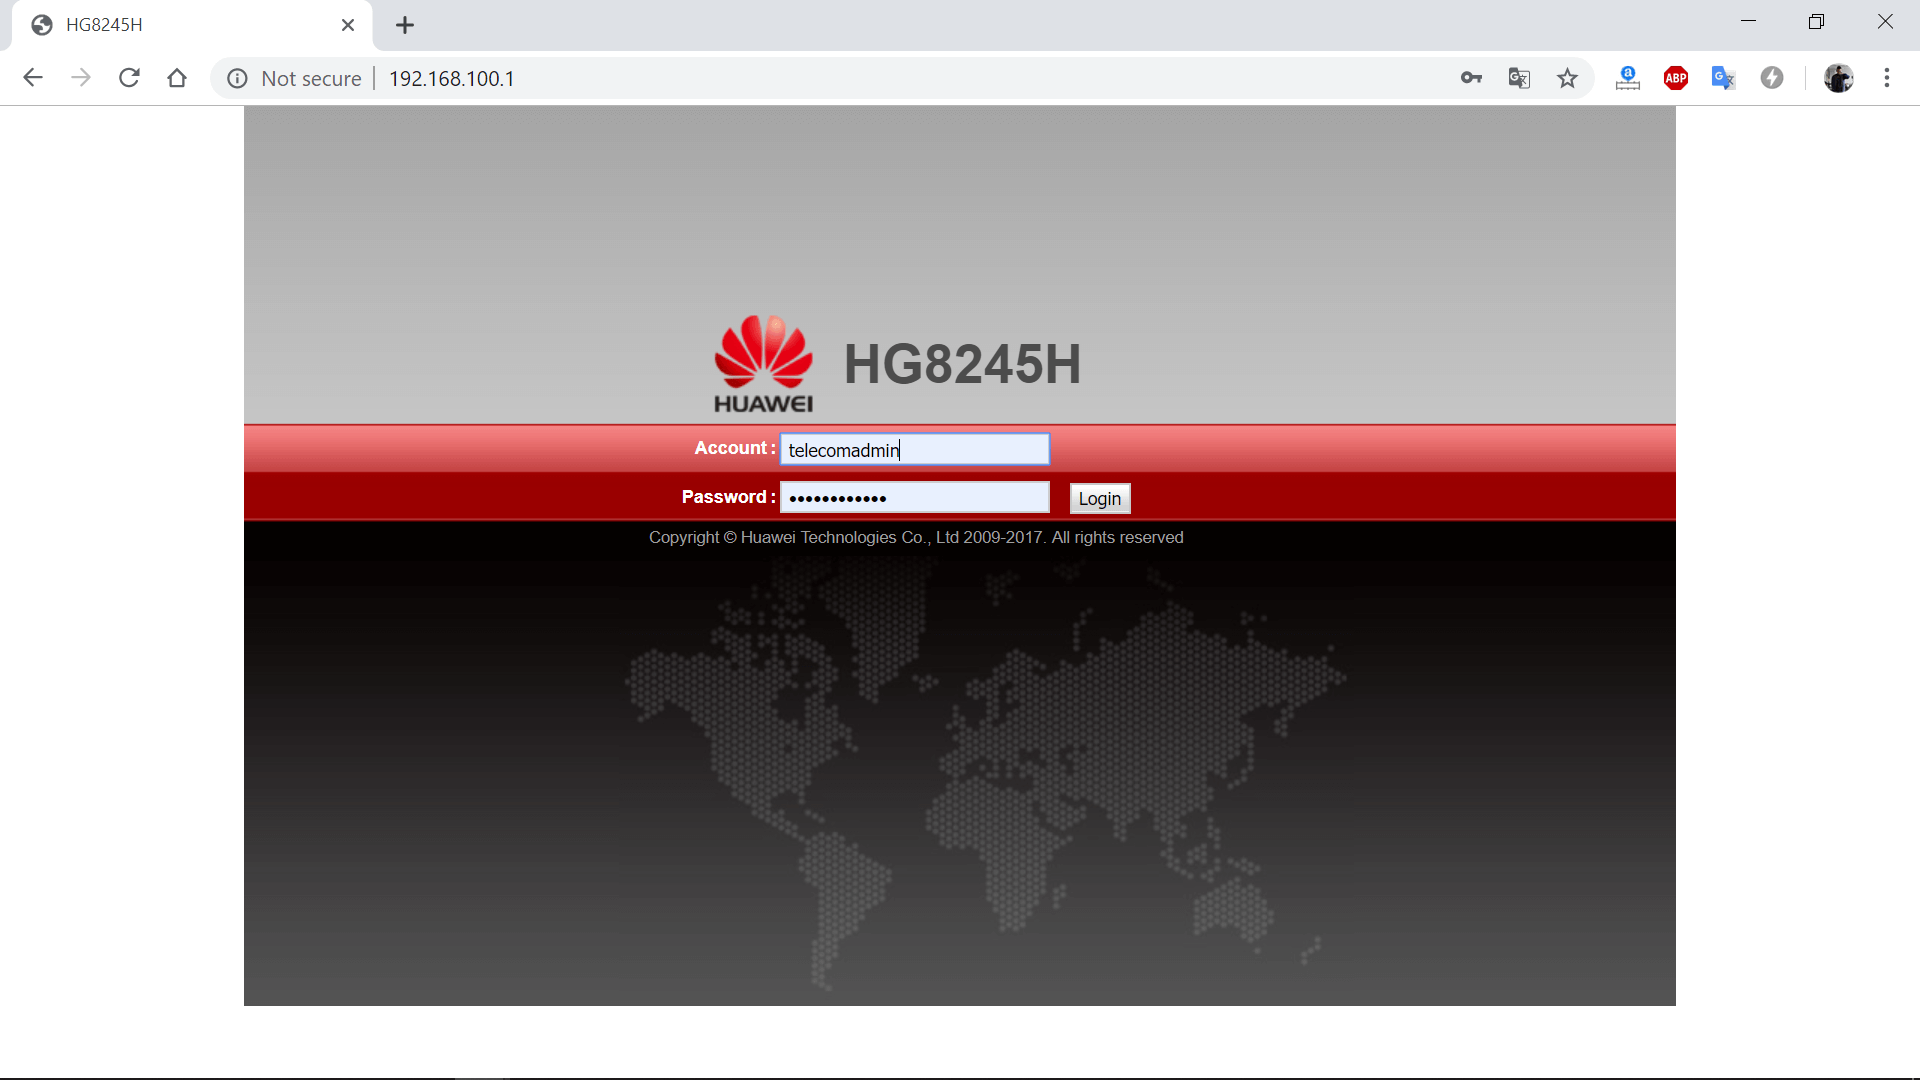 Layar-perangkat-Anda-akan-memunculkan-sebuah-pop-up-yang-meminta-Anda-untuk-masuk-ke-akun-modem-Huawei